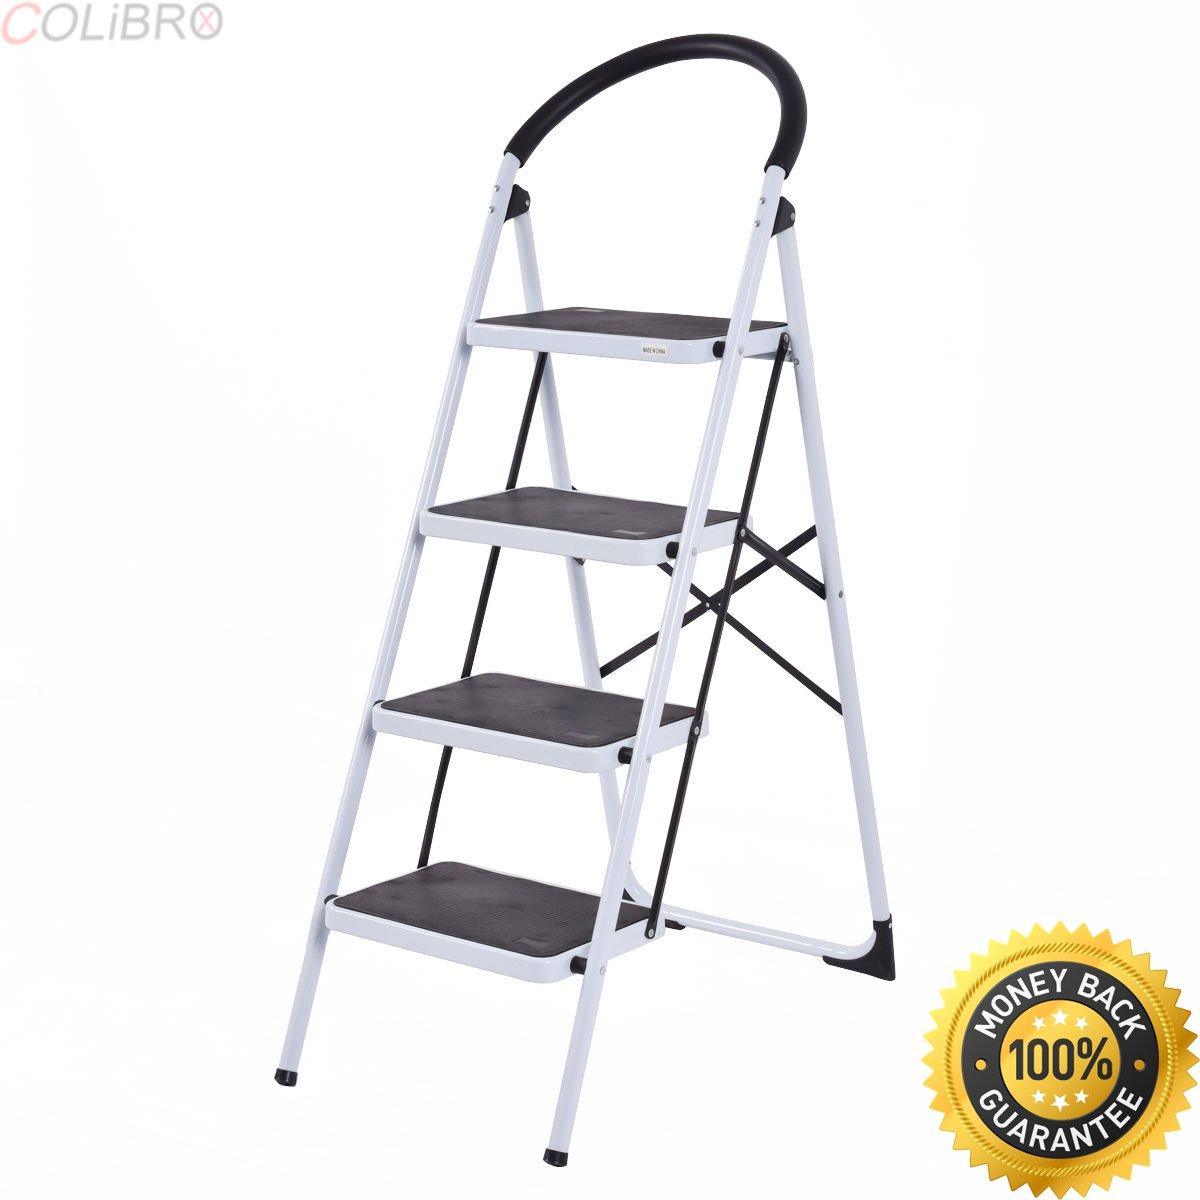 Pleasant Colibrox 4 Step Ladder Folding Stool Heavy Duty 330Lbs Inzonedesignstudio Interior Chair Design Inzonedesignstudiocom